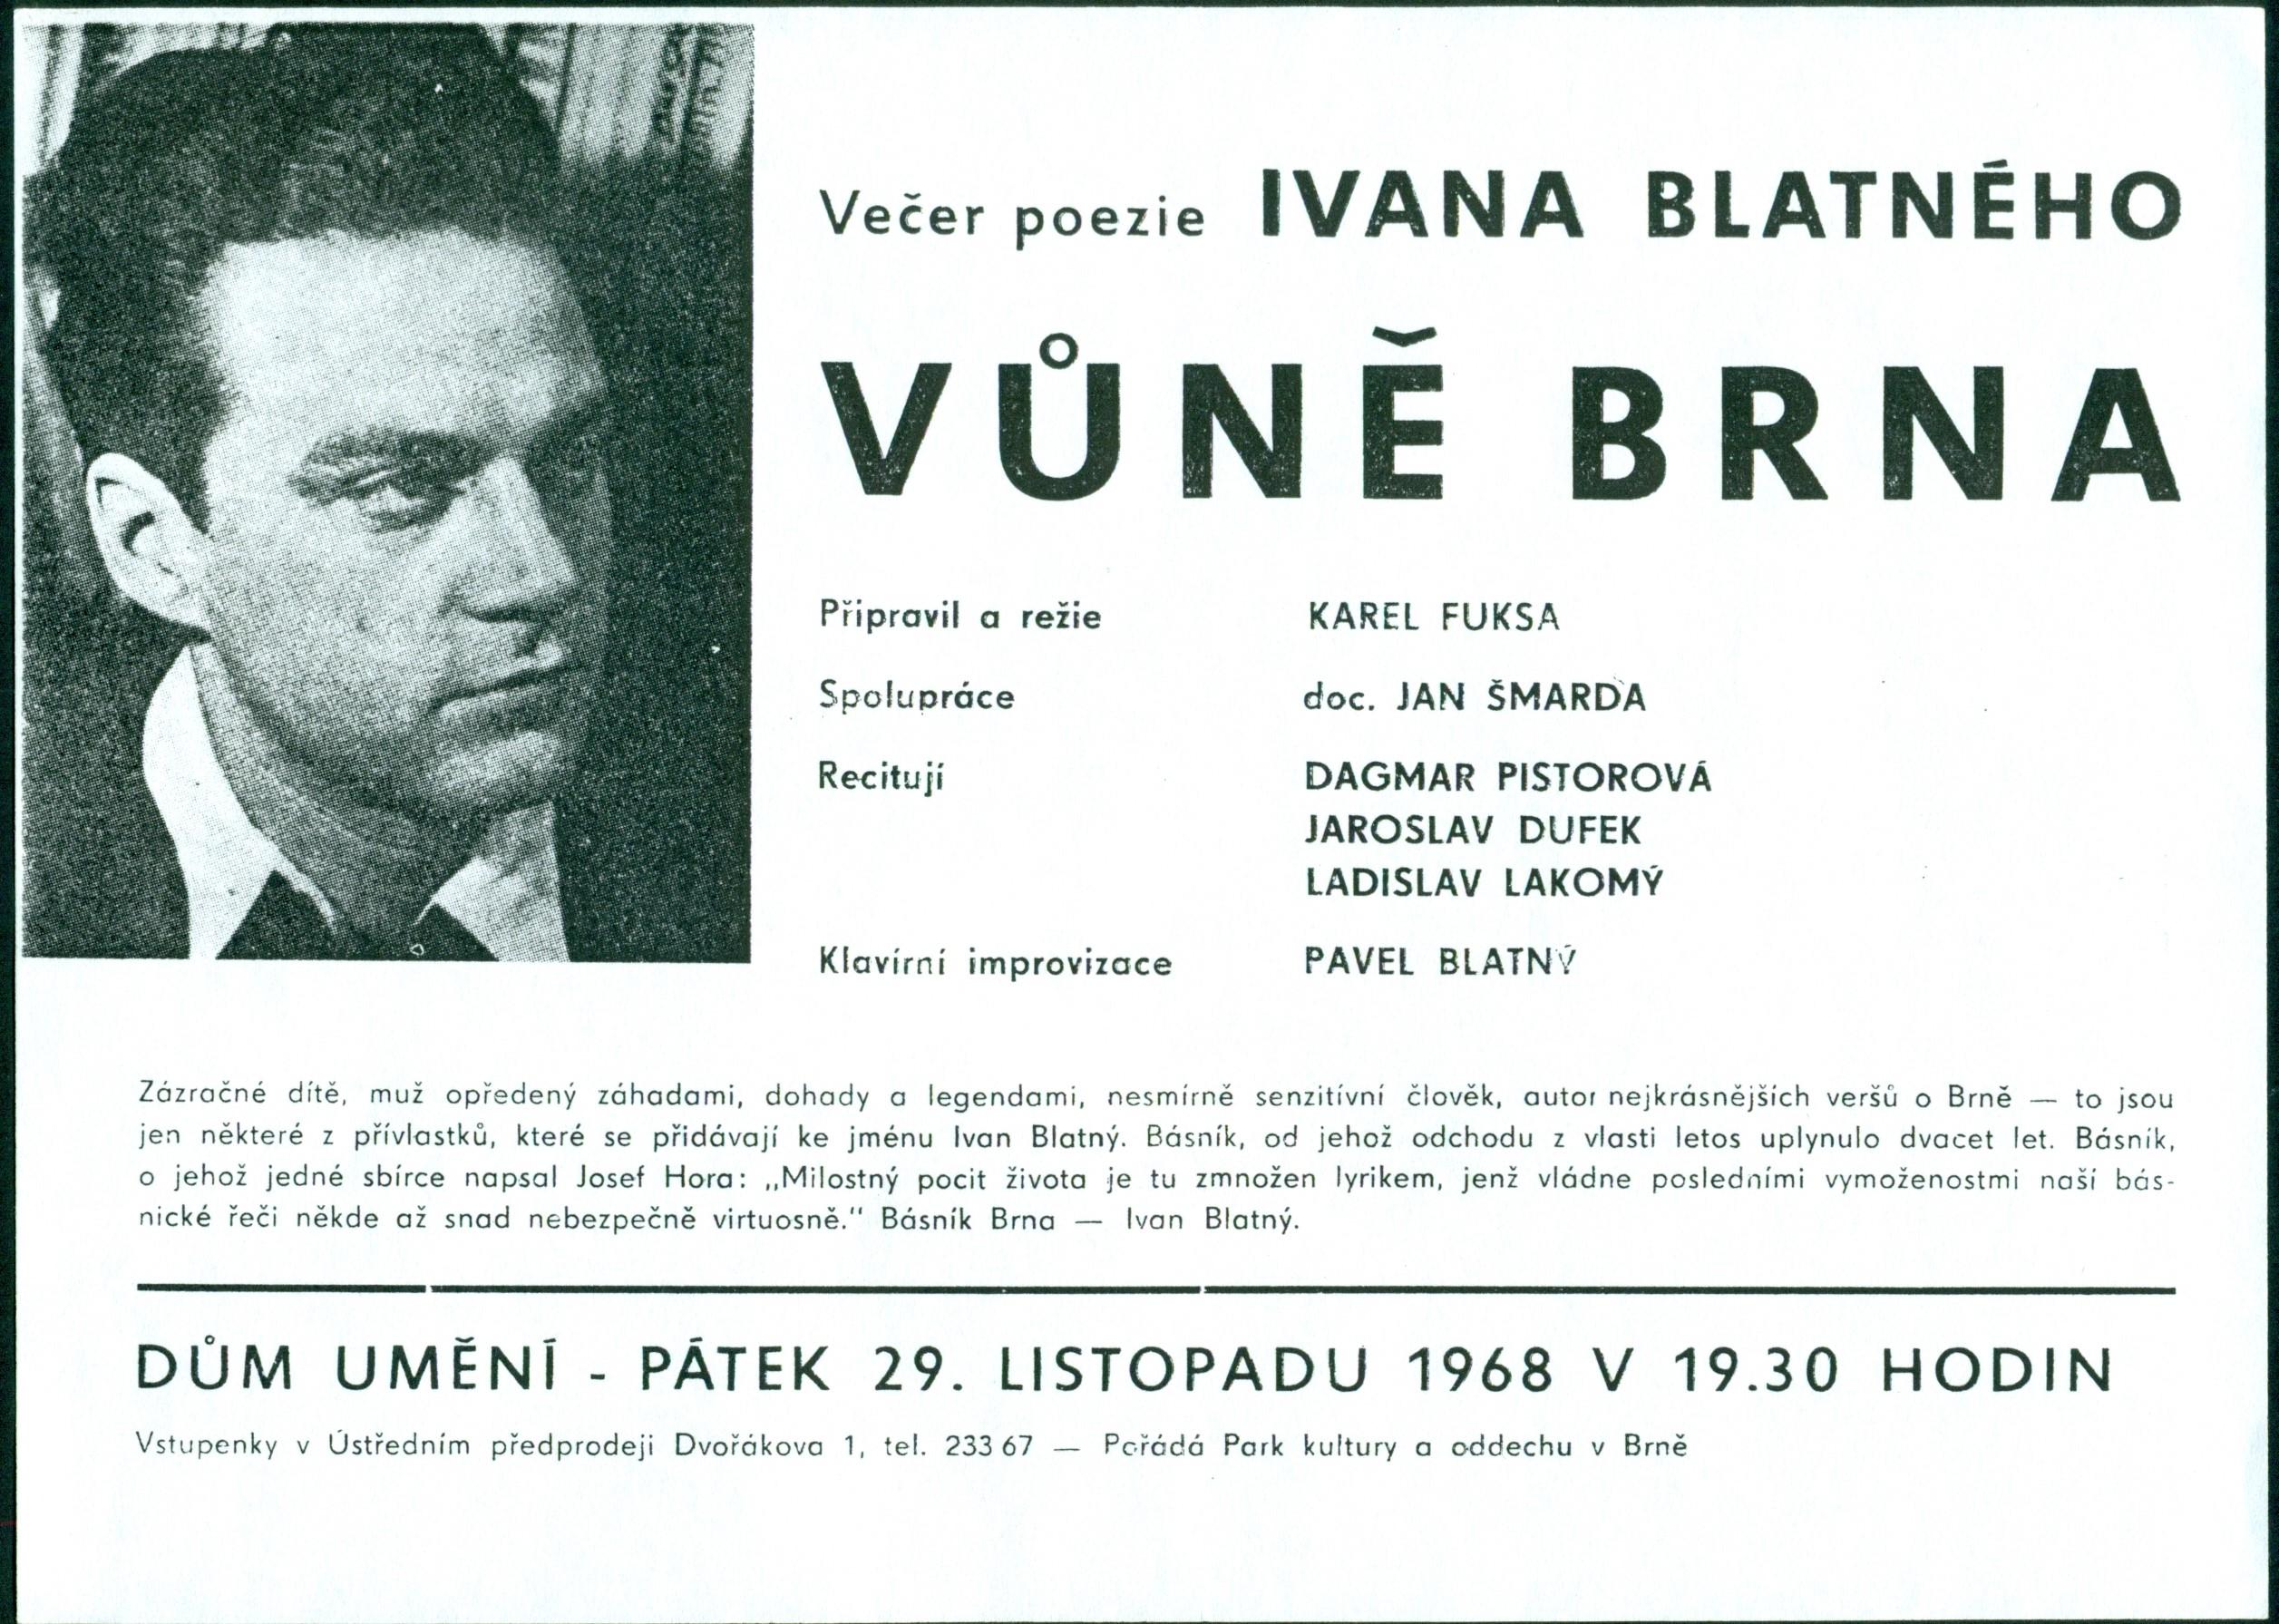 Vůně Brna. Večer poezie Ivana Blatného (Smells of Brno. Evening of Ivan Blatný's Poetry), 1968.